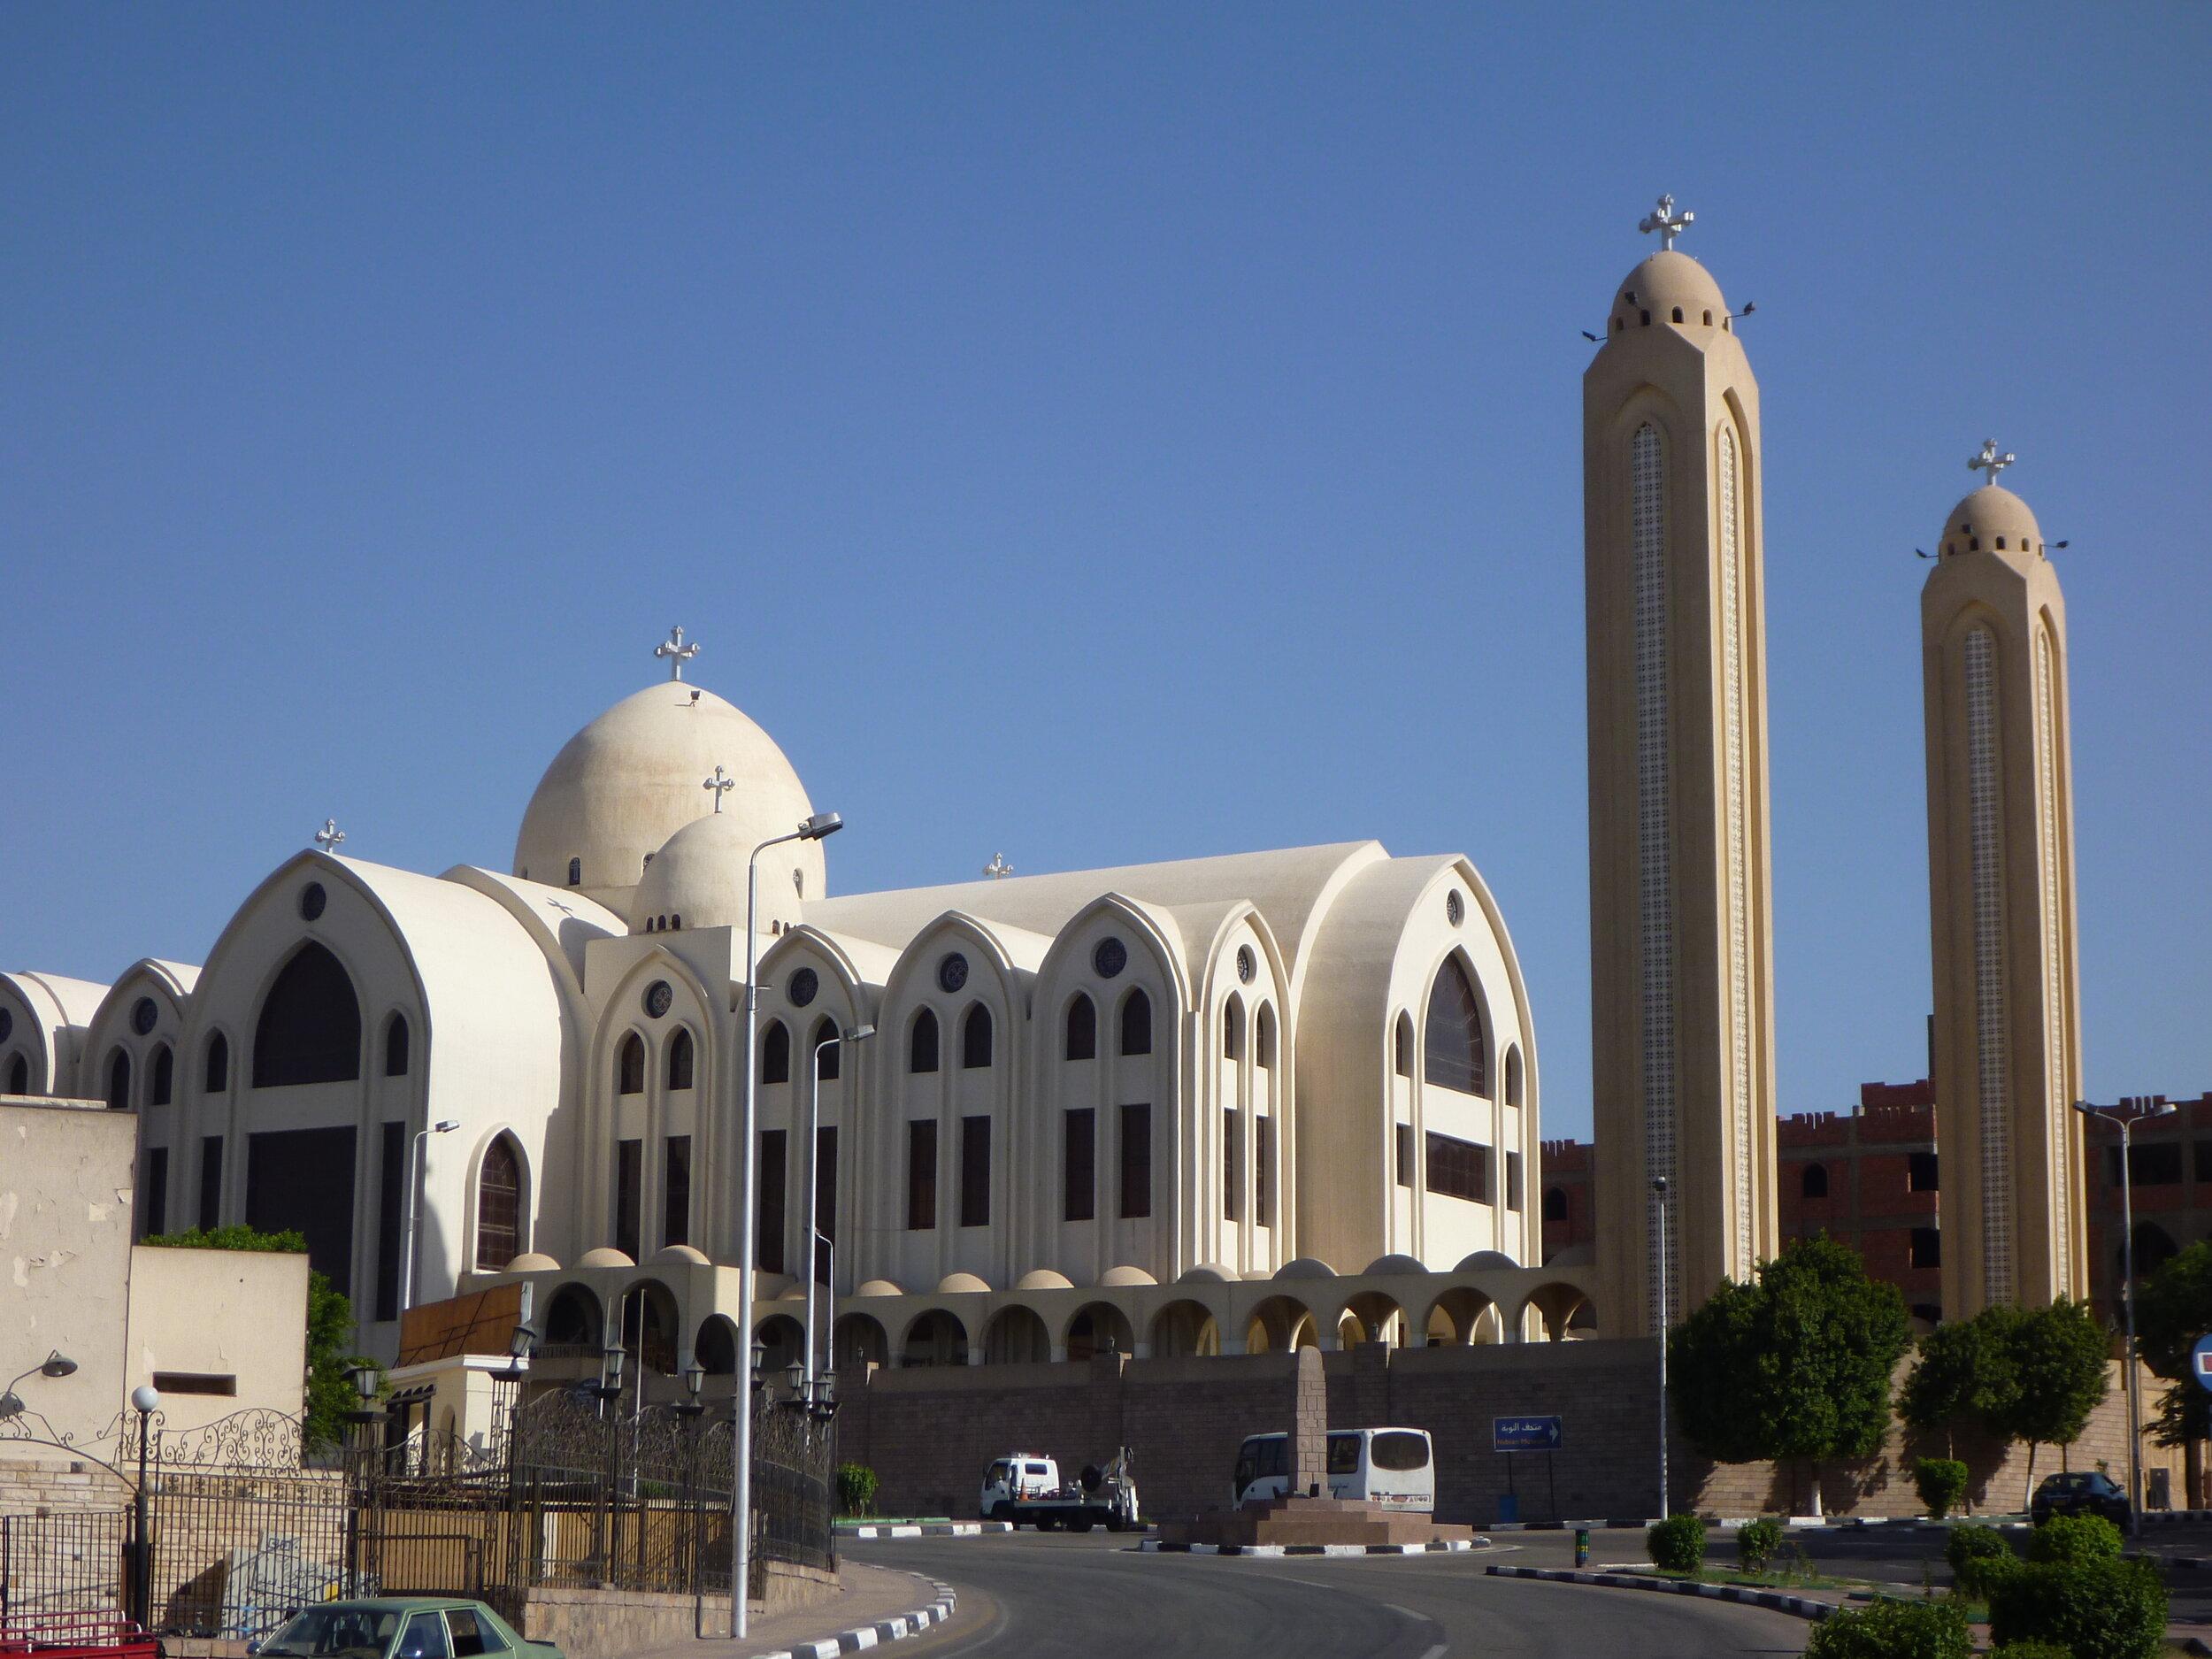 Archangel Michael's Coptic Orthodox Cathedral, Aswan, Egypt